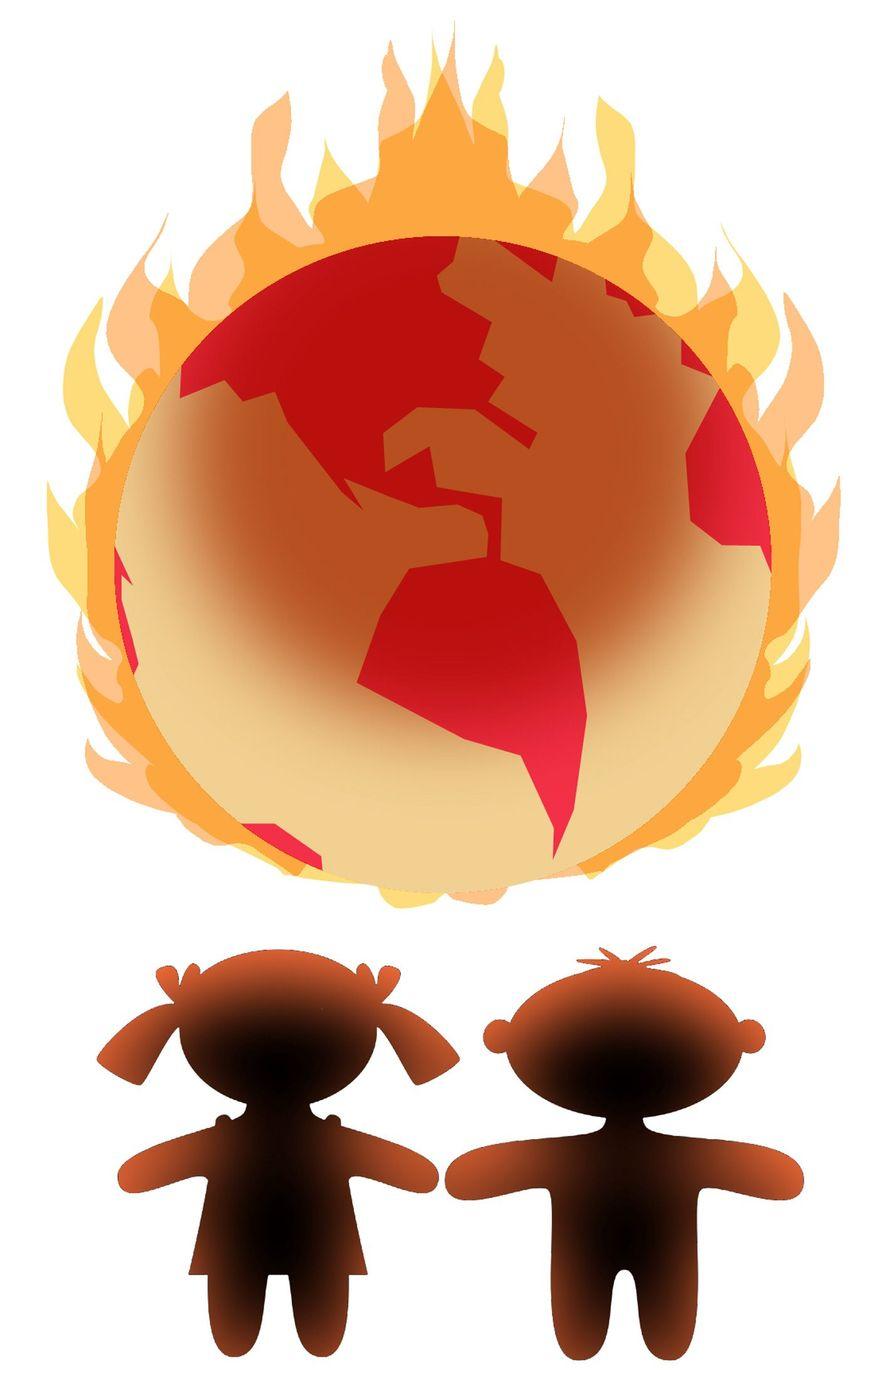 Illustration on climate change alarmism's effects on children by Alexander Hunter/The Washington Times